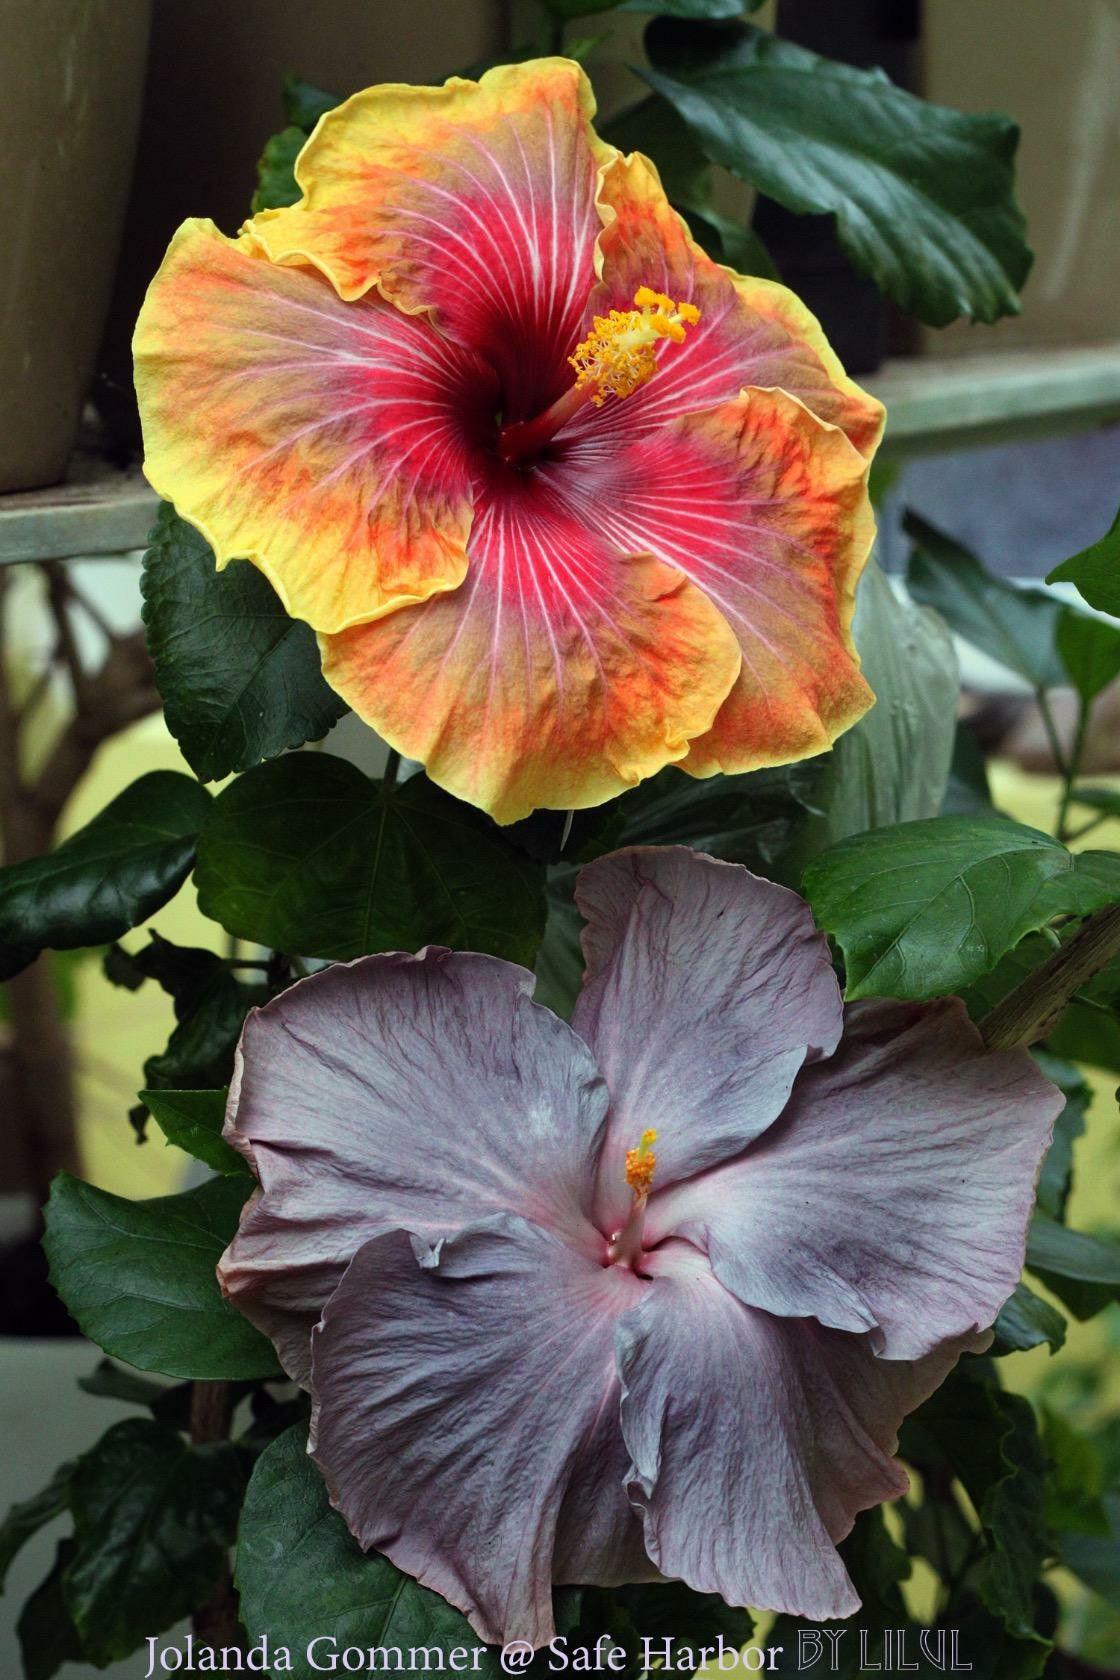 Pin by c on pinterest hibiscus flowers hibiscus flowers faces beautiful flowers gardens hibiscus pretty flowers outdoor gardens the face garden izmirmasajfo